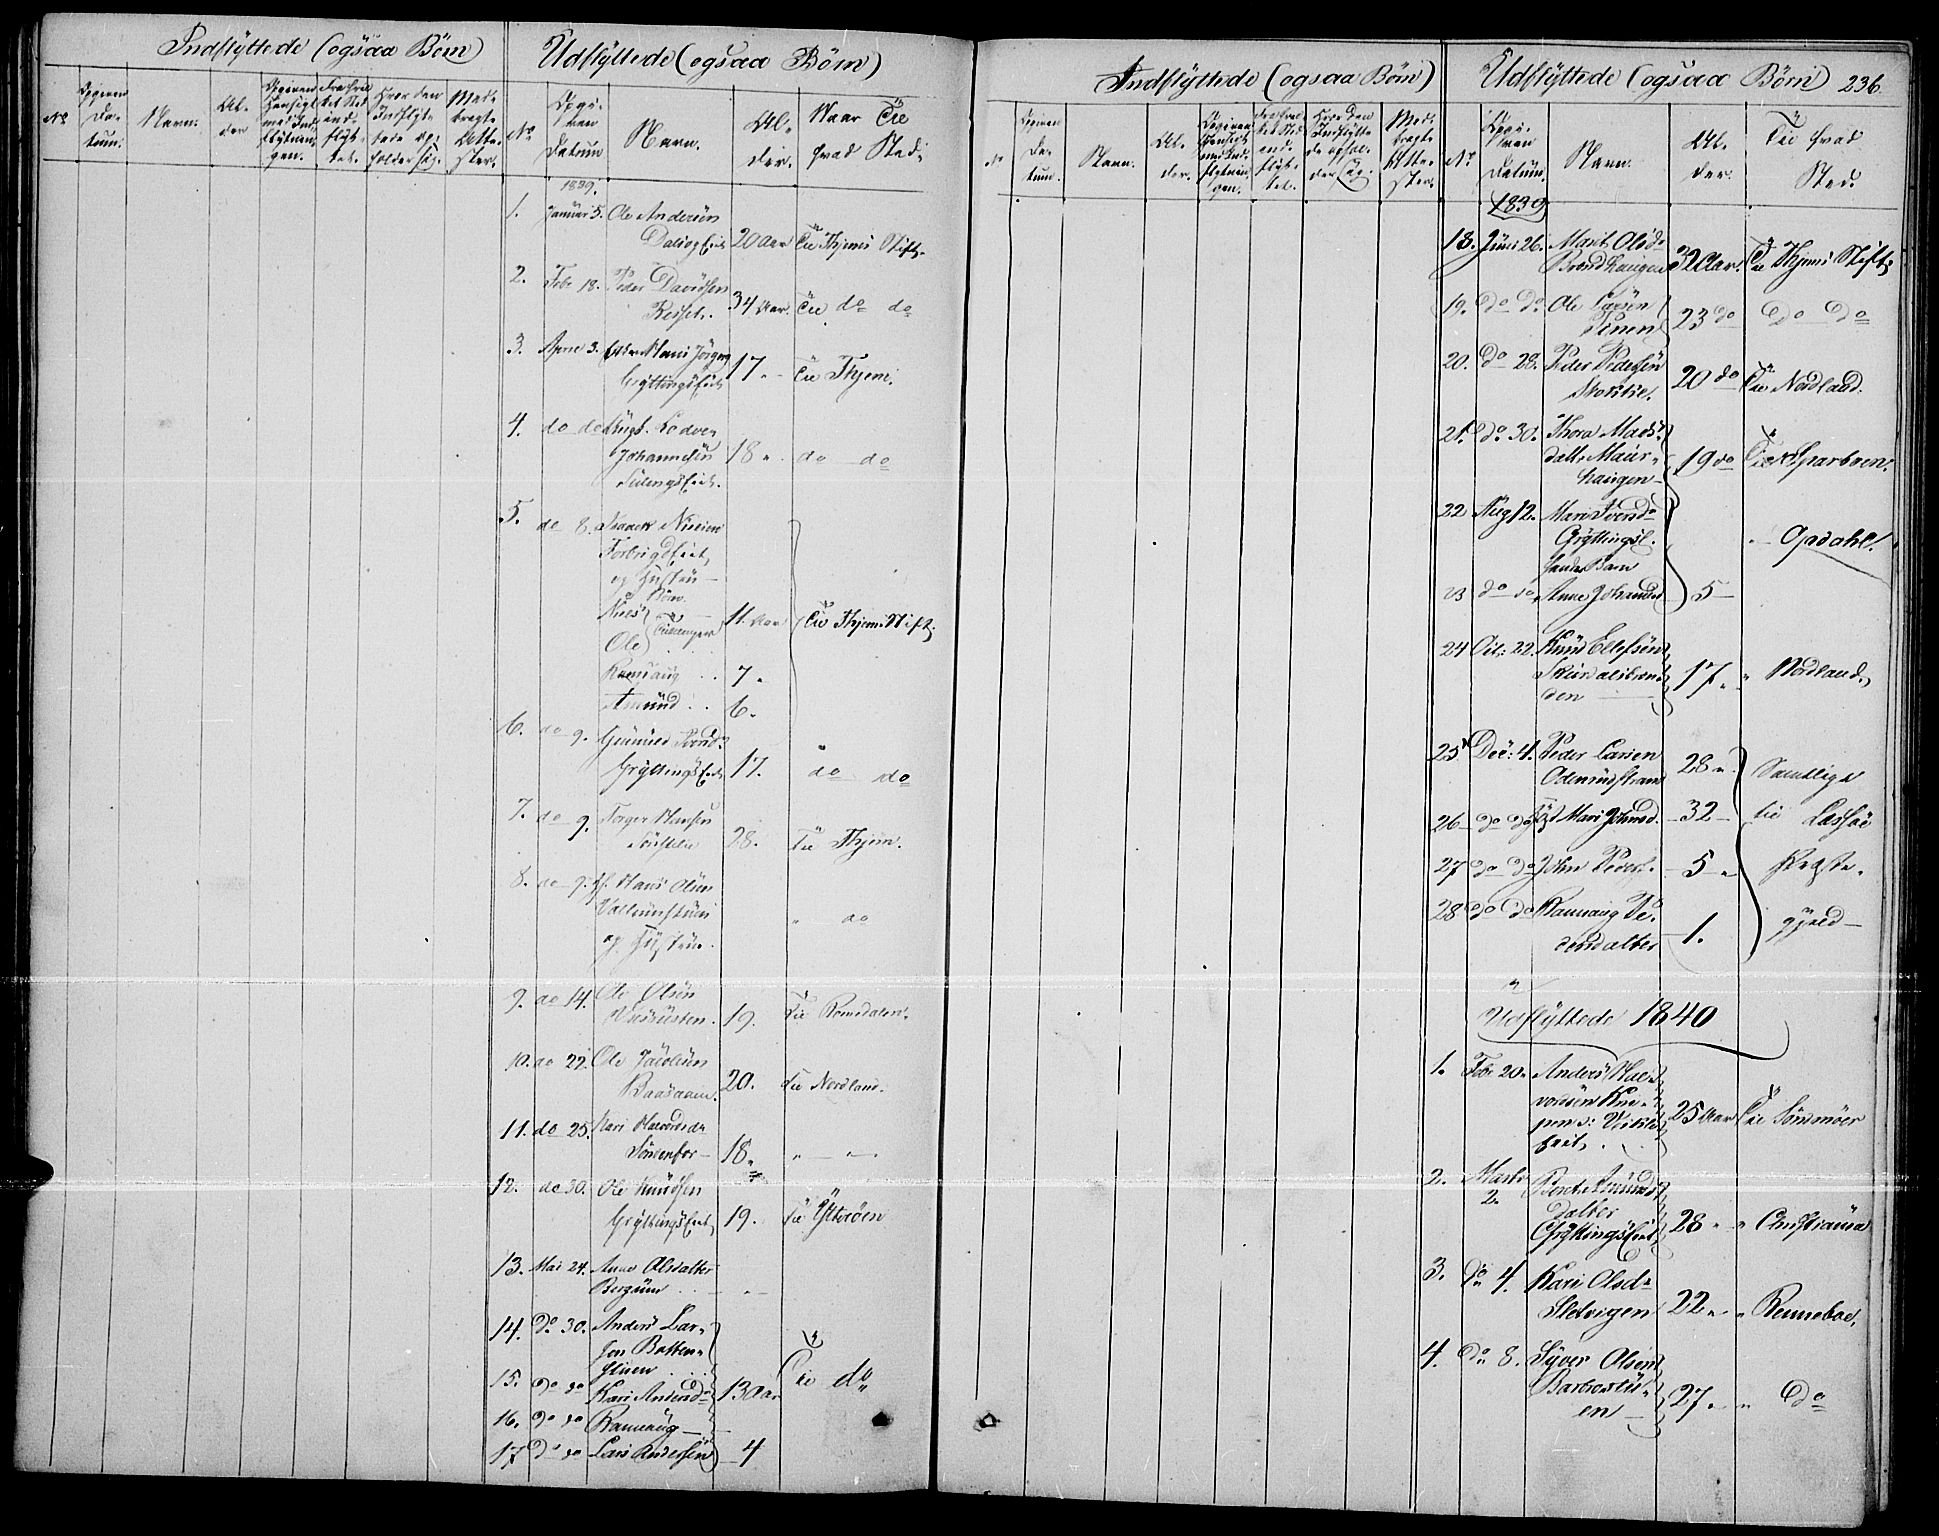 SAH, Fron prestekontor, H/Ha/Haa/L0004: Ministerialbok nr. 4, 1839-1848, s. 236